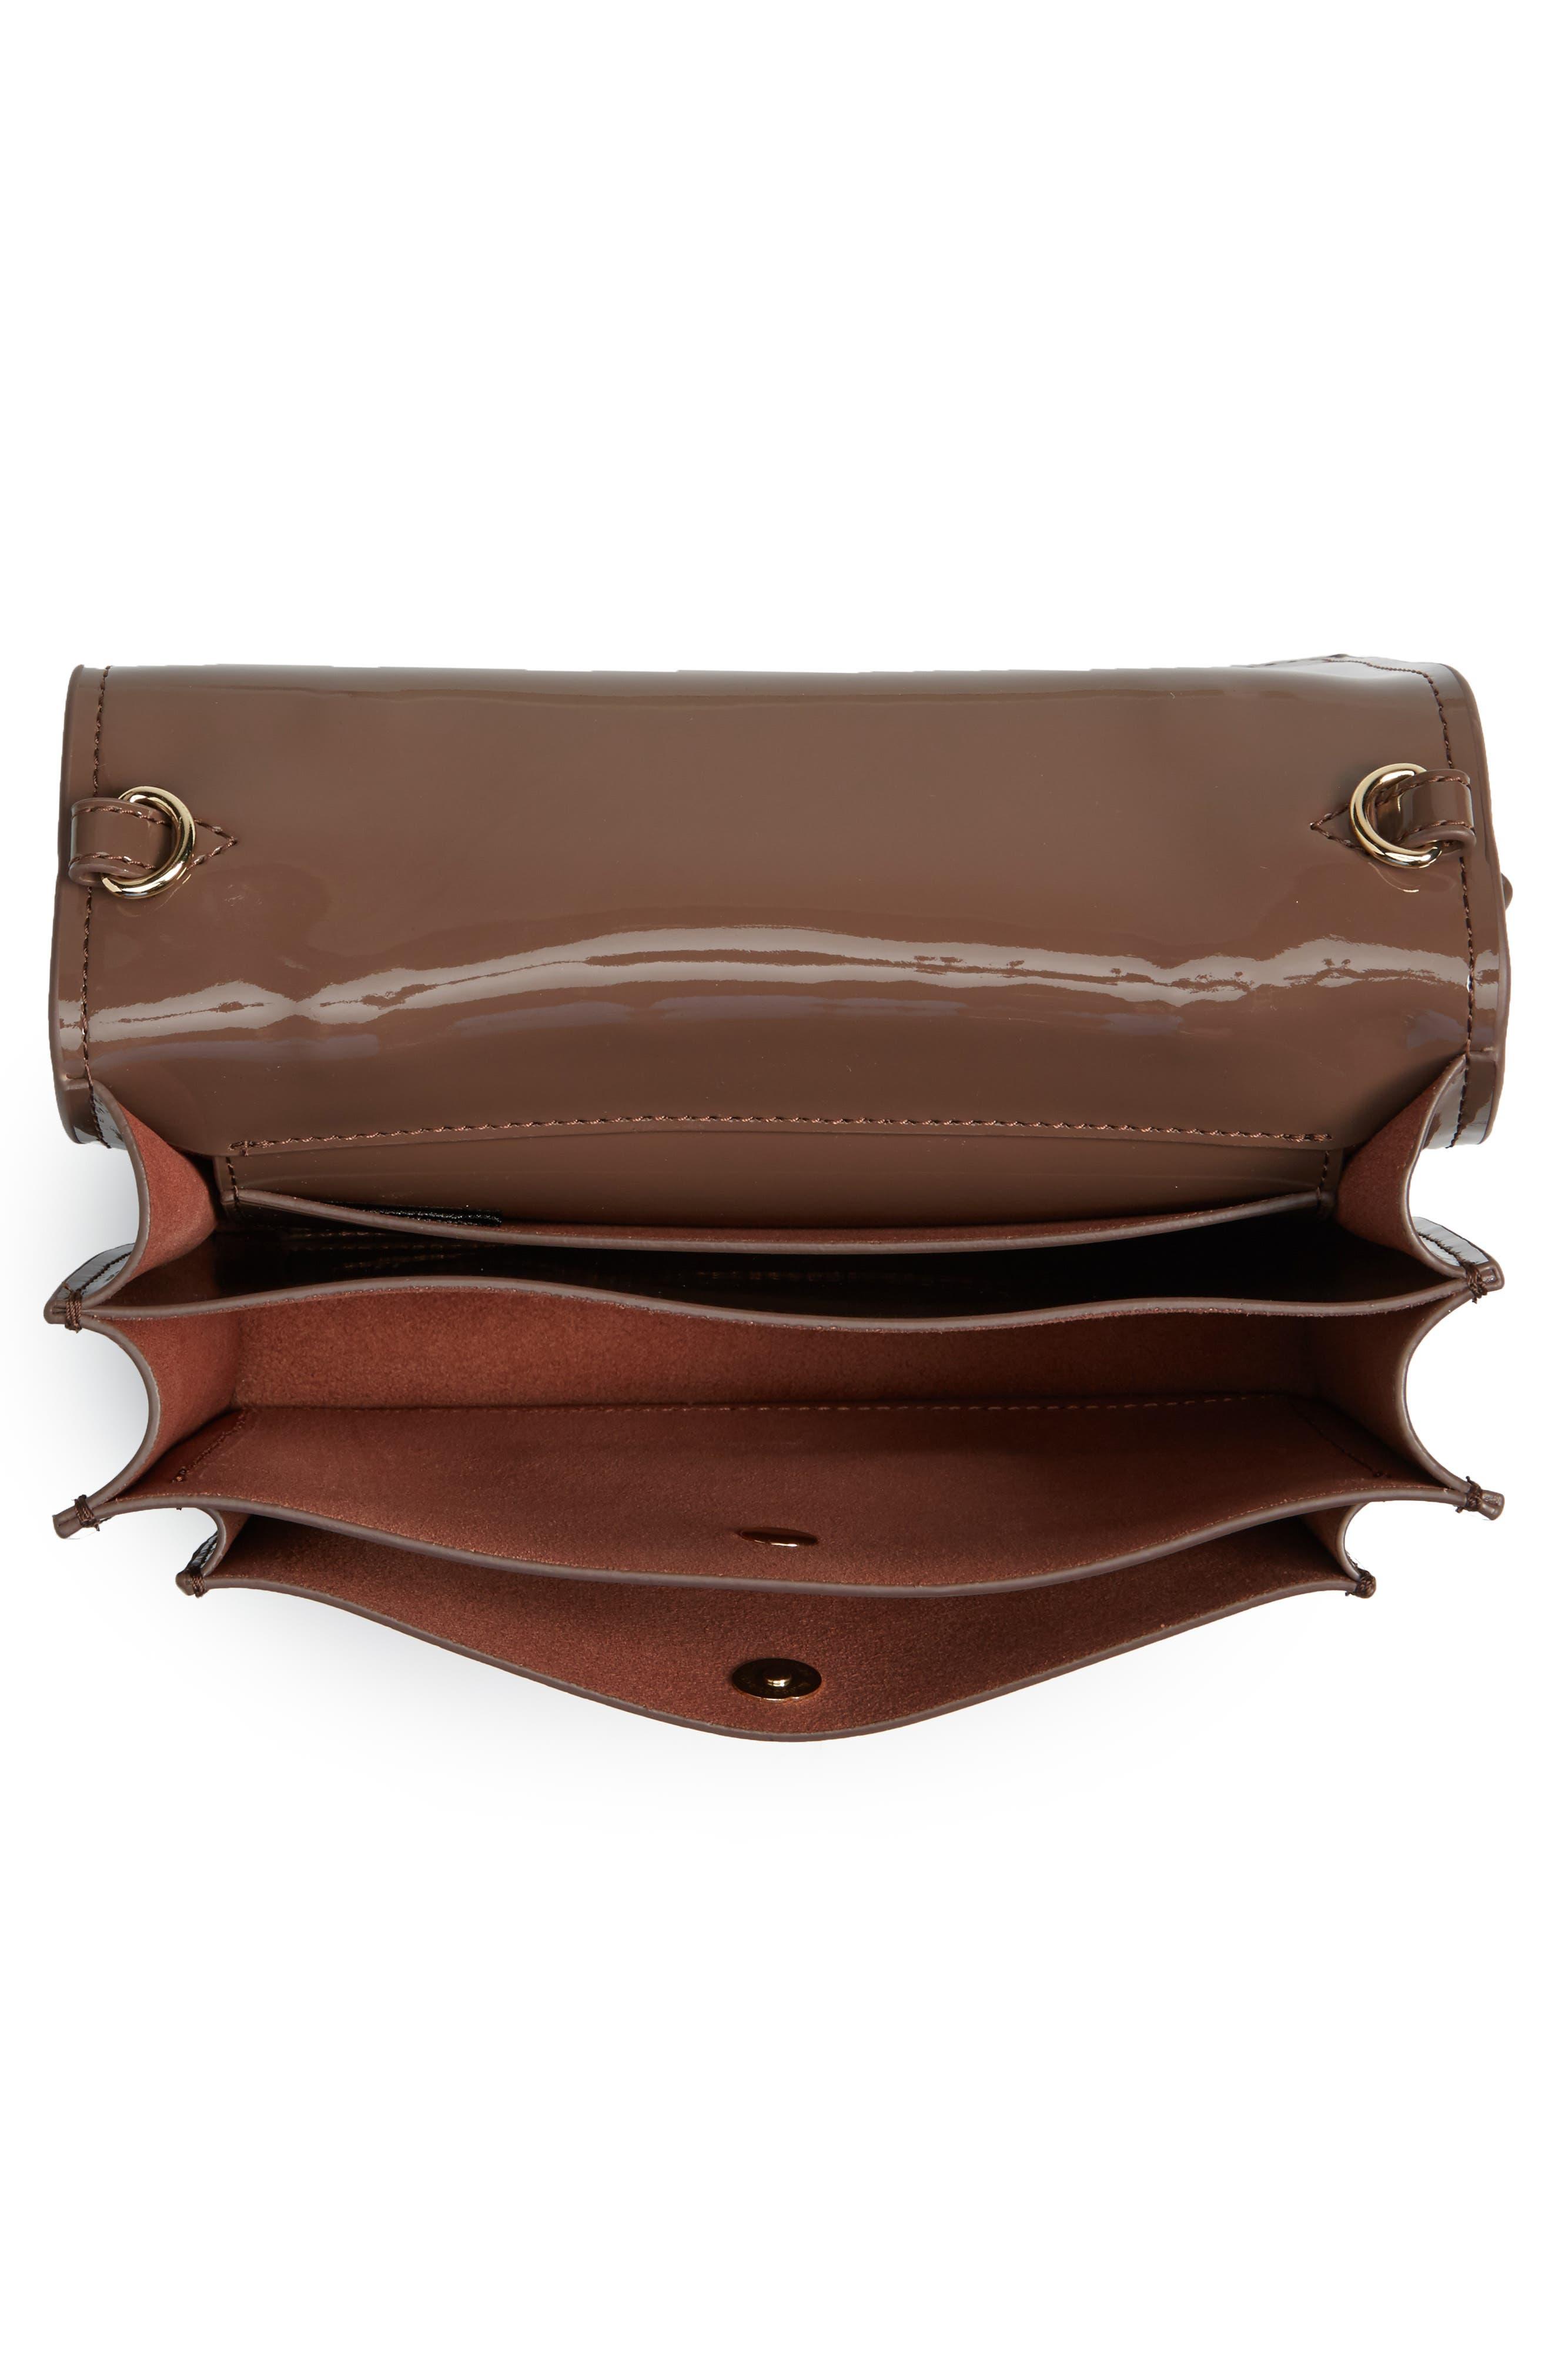 Earthette Patent Leather Accordion Bag,                             Alternate thumbnail 4, color,                             202